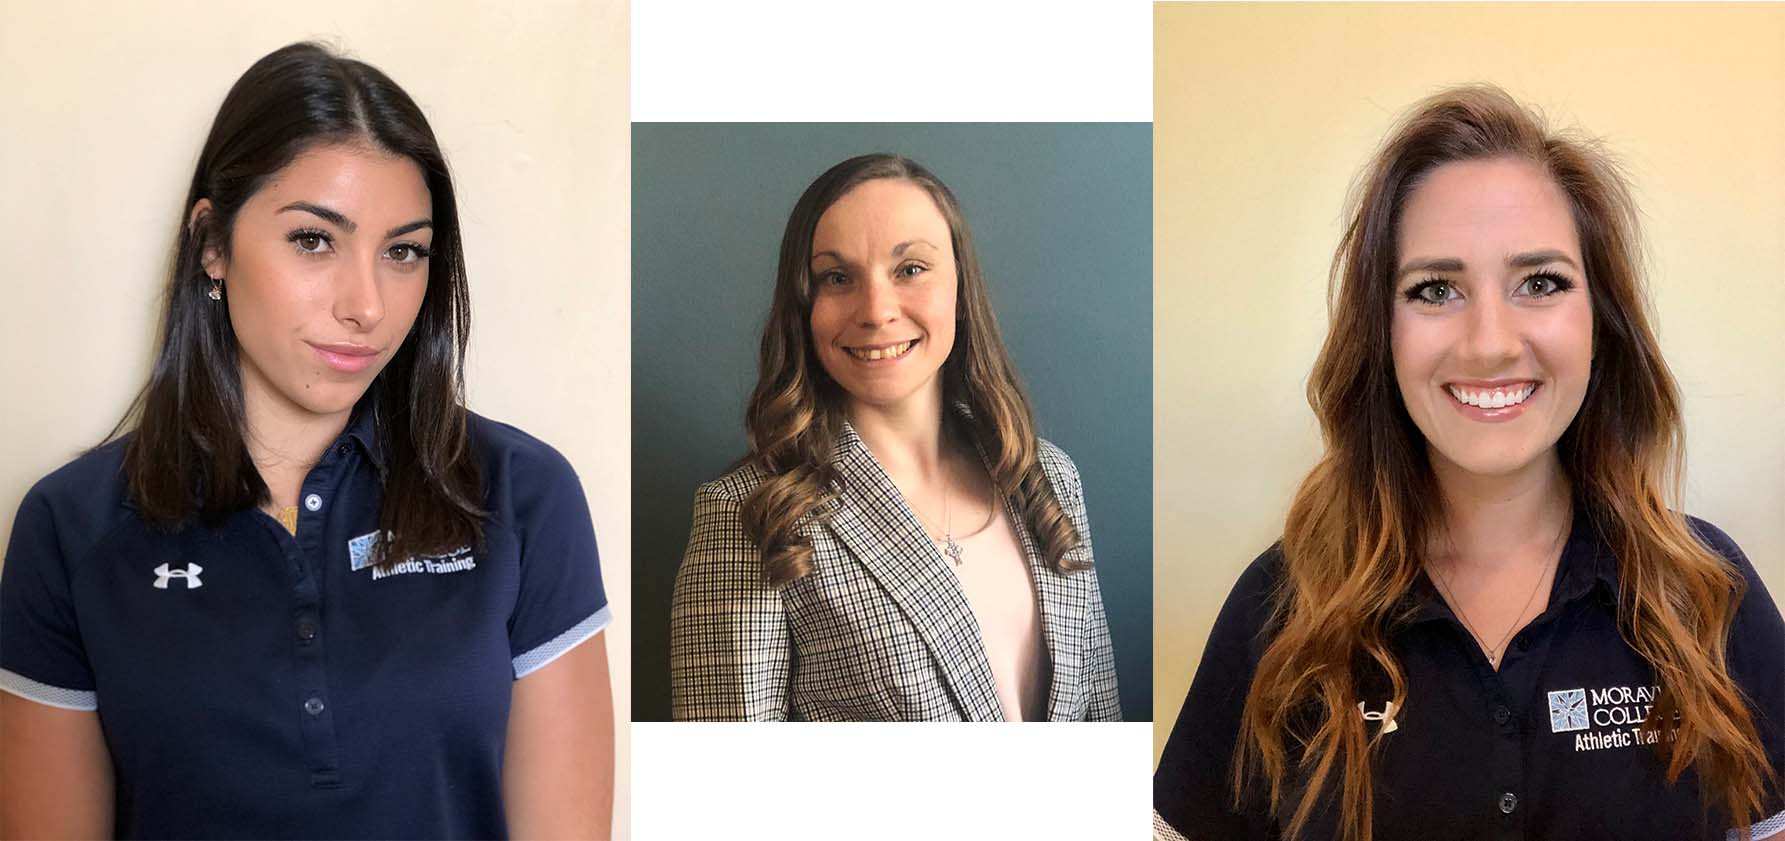 AT students pictured from left to right: Jessie Vallorosi, Kellie Wanamaker, Alexandra Vladyka